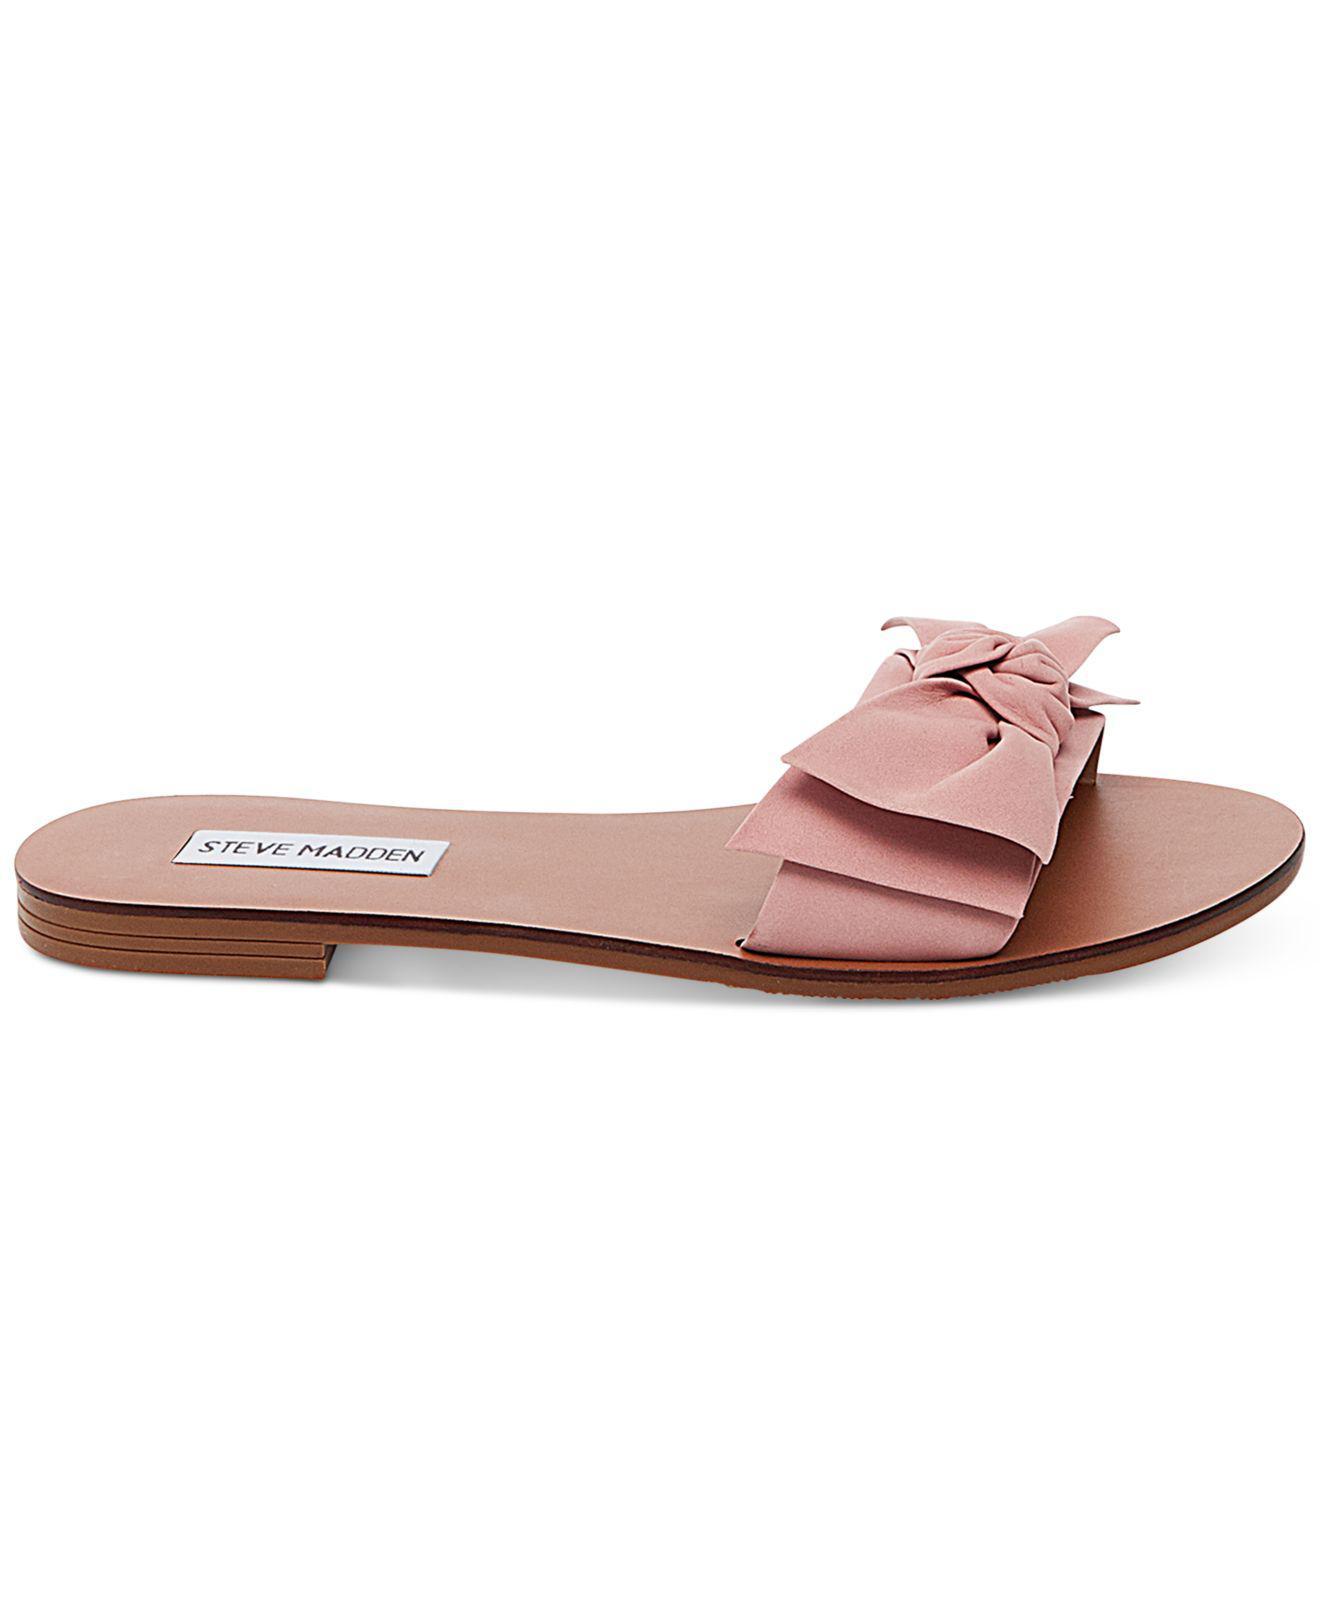 5b2eb580602 Steve-Madden-Womens-Knotss-Bow-Flat-Slide-Sandals thumbnail